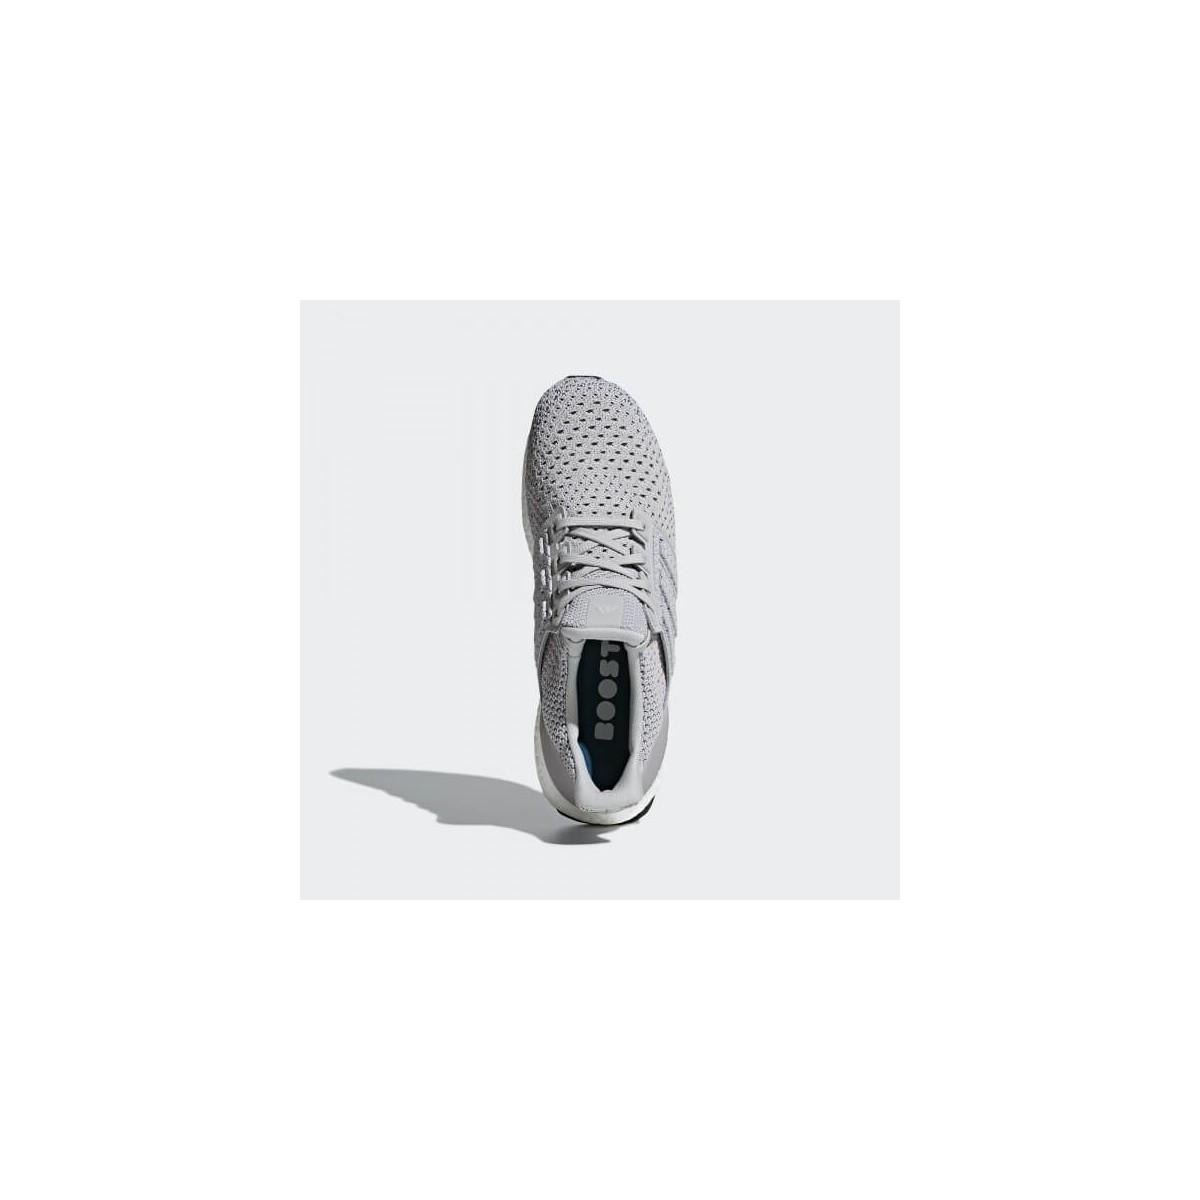 85db074173d4f Adidas Ultra Boost Clima Grey SS18 Man Running shoes